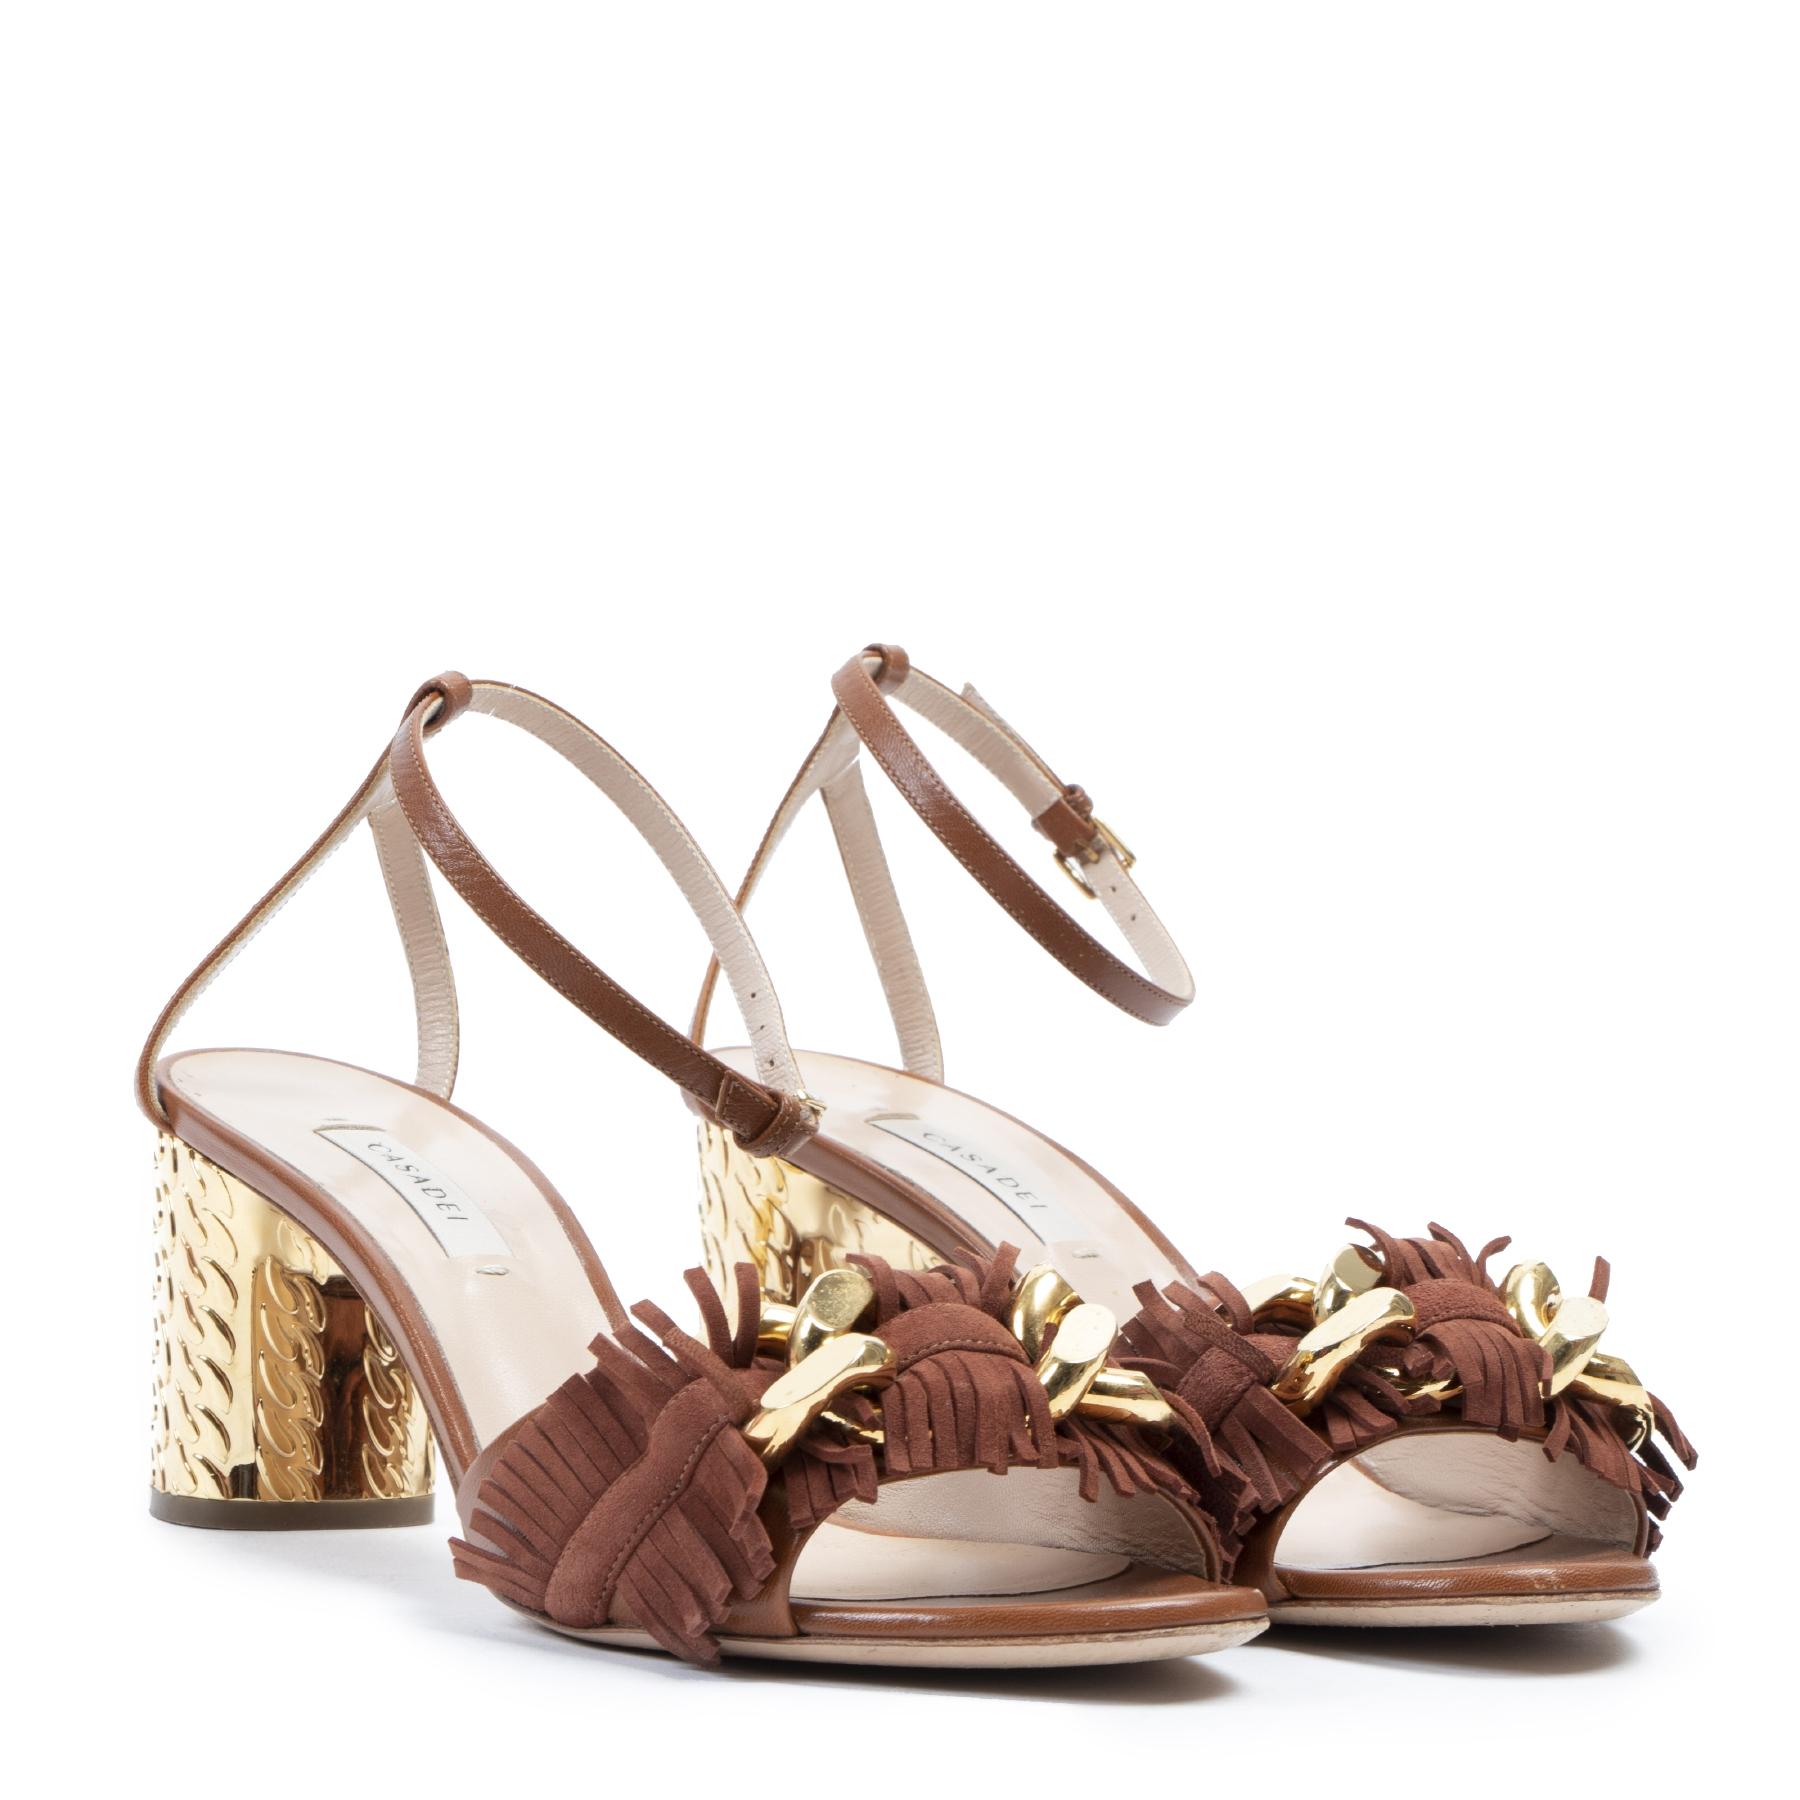 Authentieke tweedehands vintage Casadei Brown Chain Trimmed Block Heel Sandal - Size 38,5  koop online webshop LabelLOV